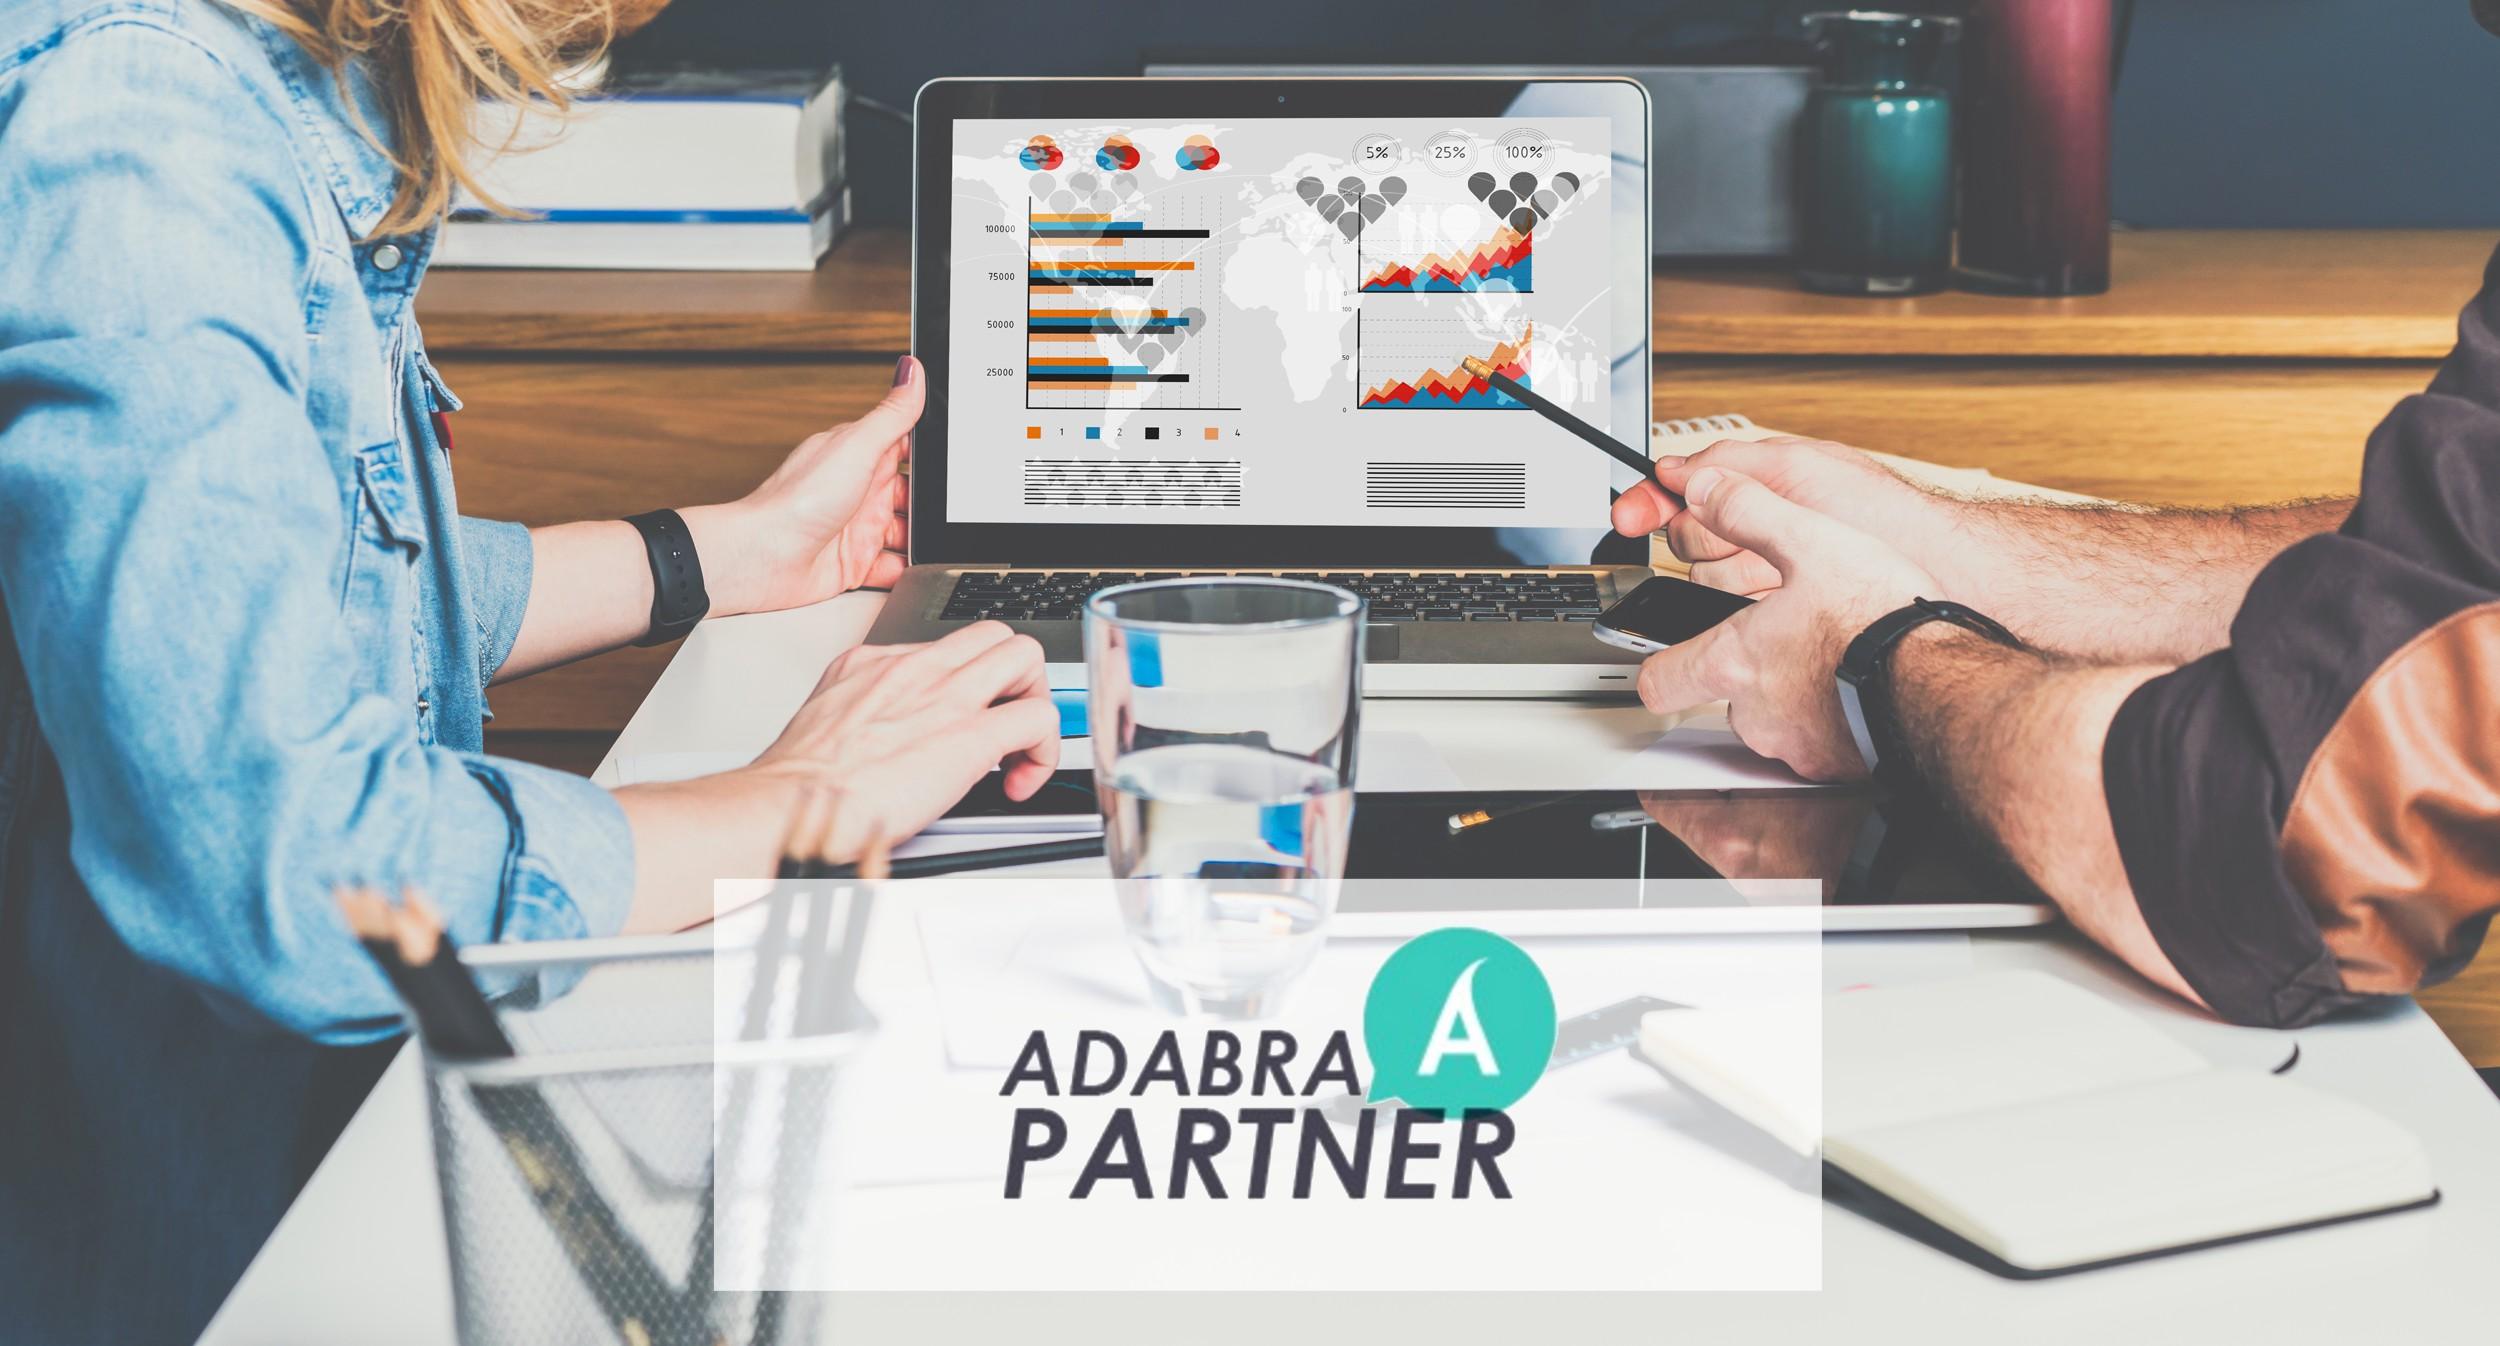 Meet the new Adabra Partner Program!